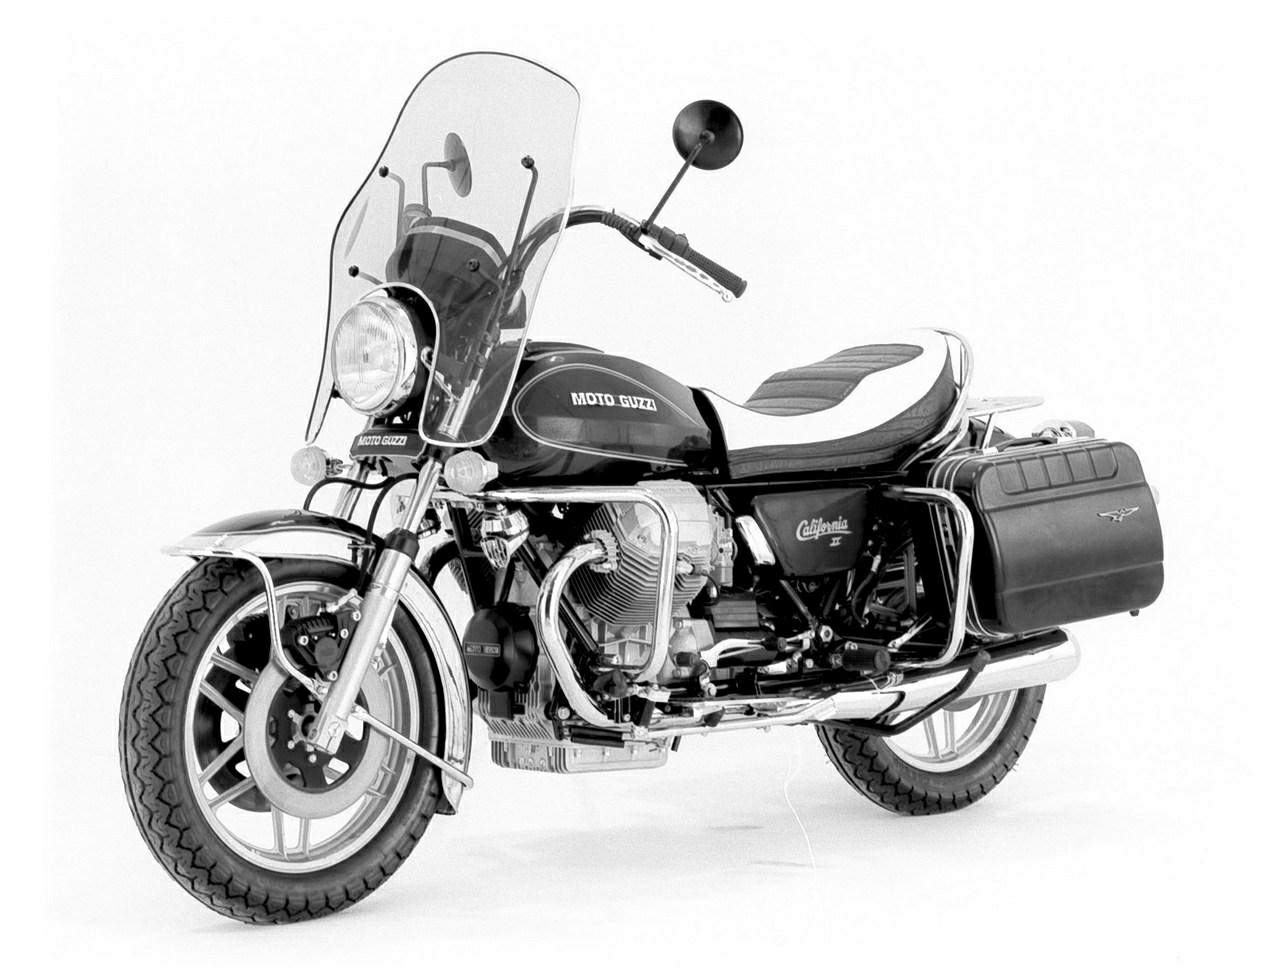 modelli storici Moto Guzzi 2